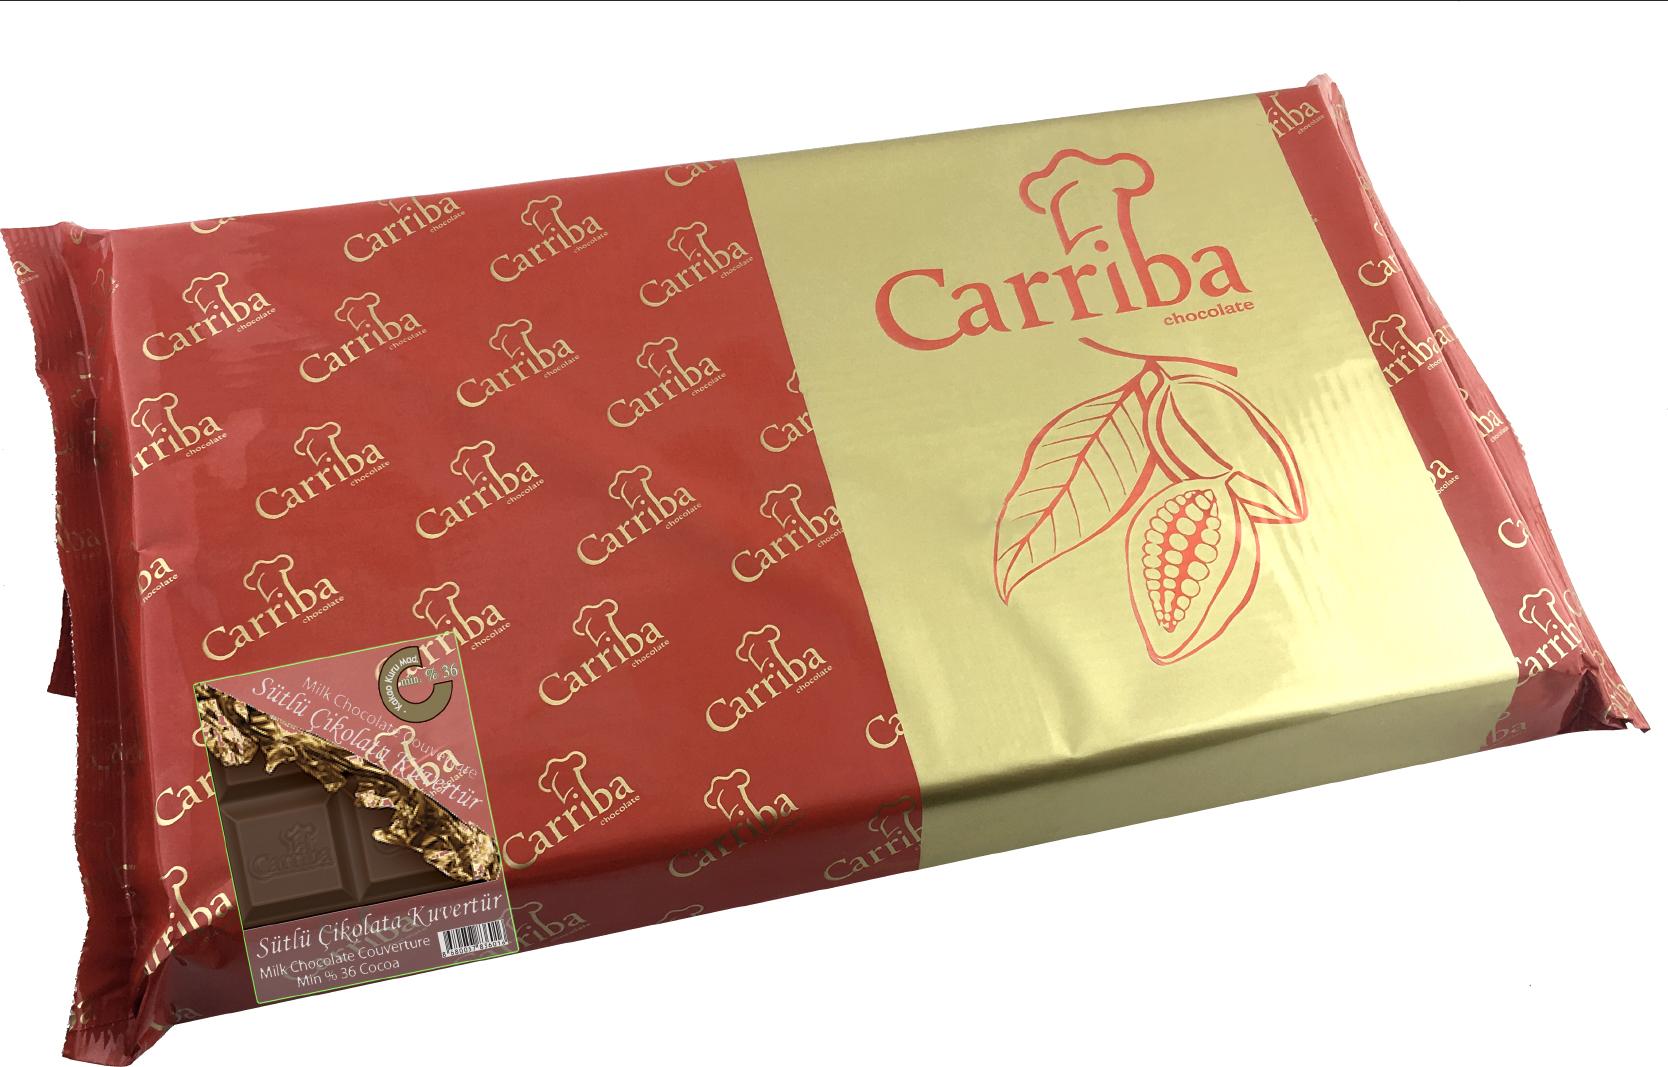 CARRIBA Sütlü Çikolata Kuvertür 2.5 Kg